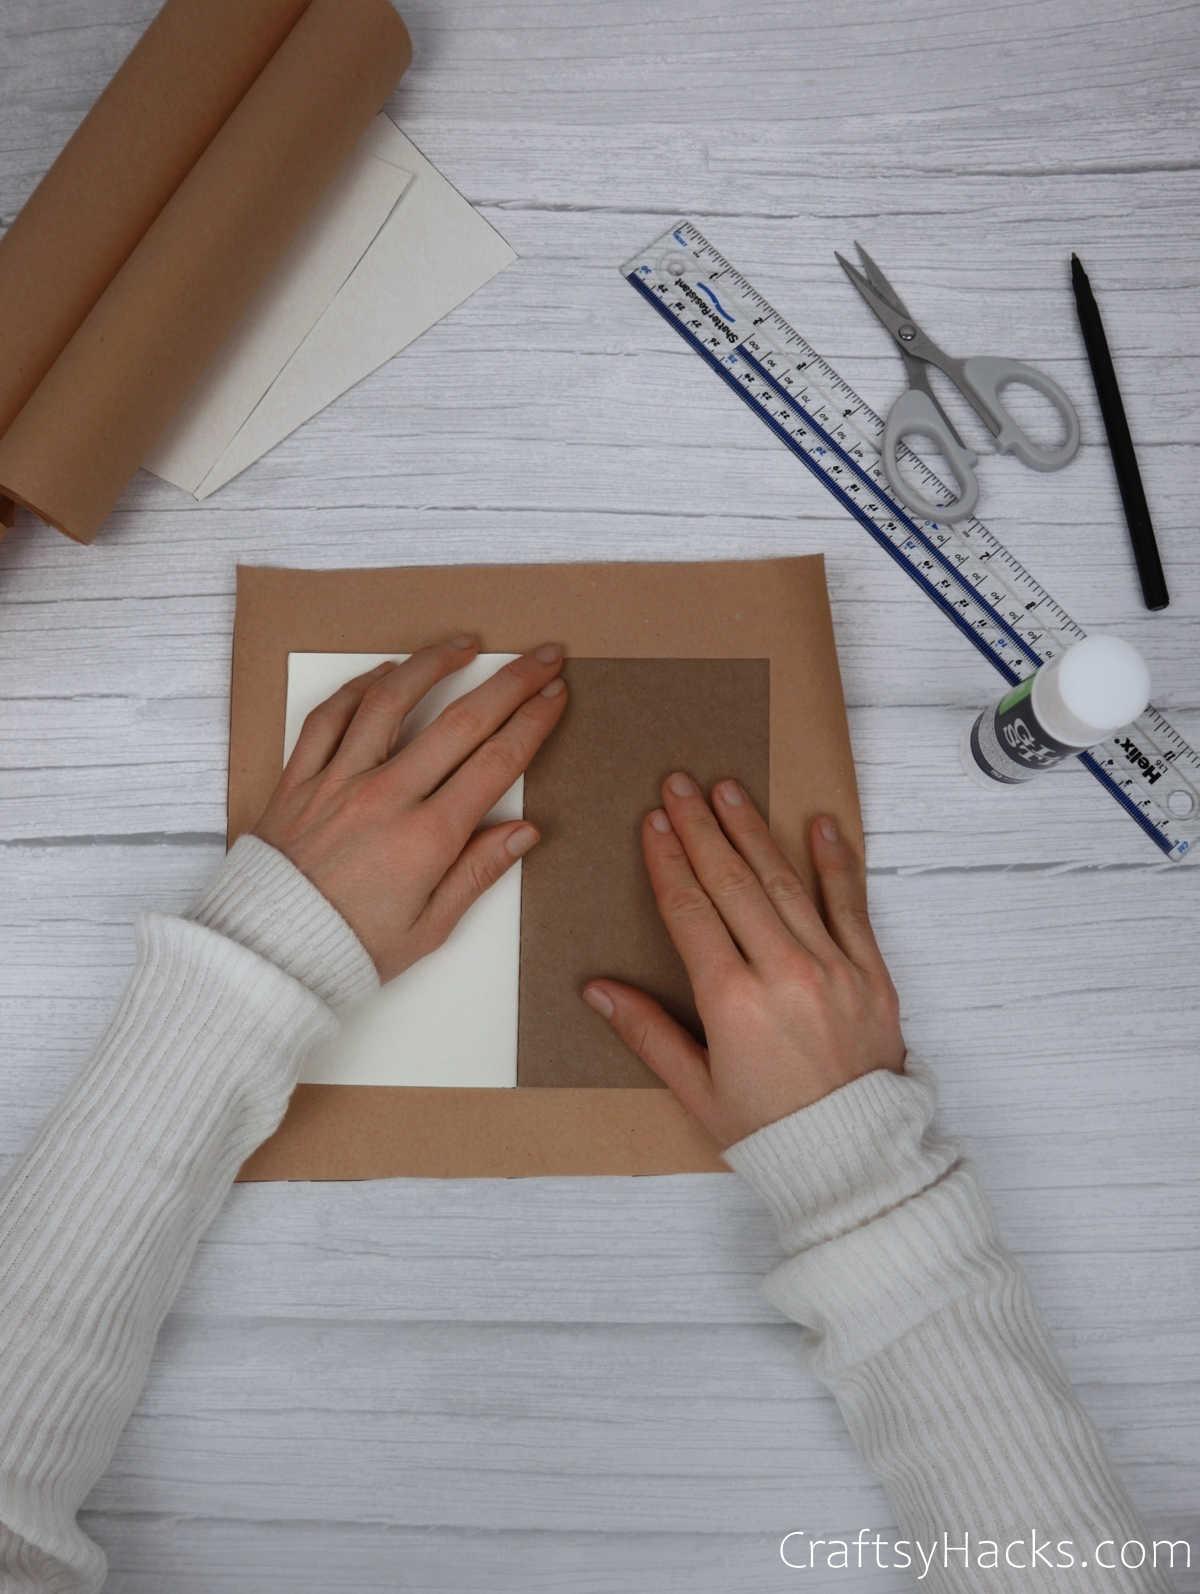 glueing down paper